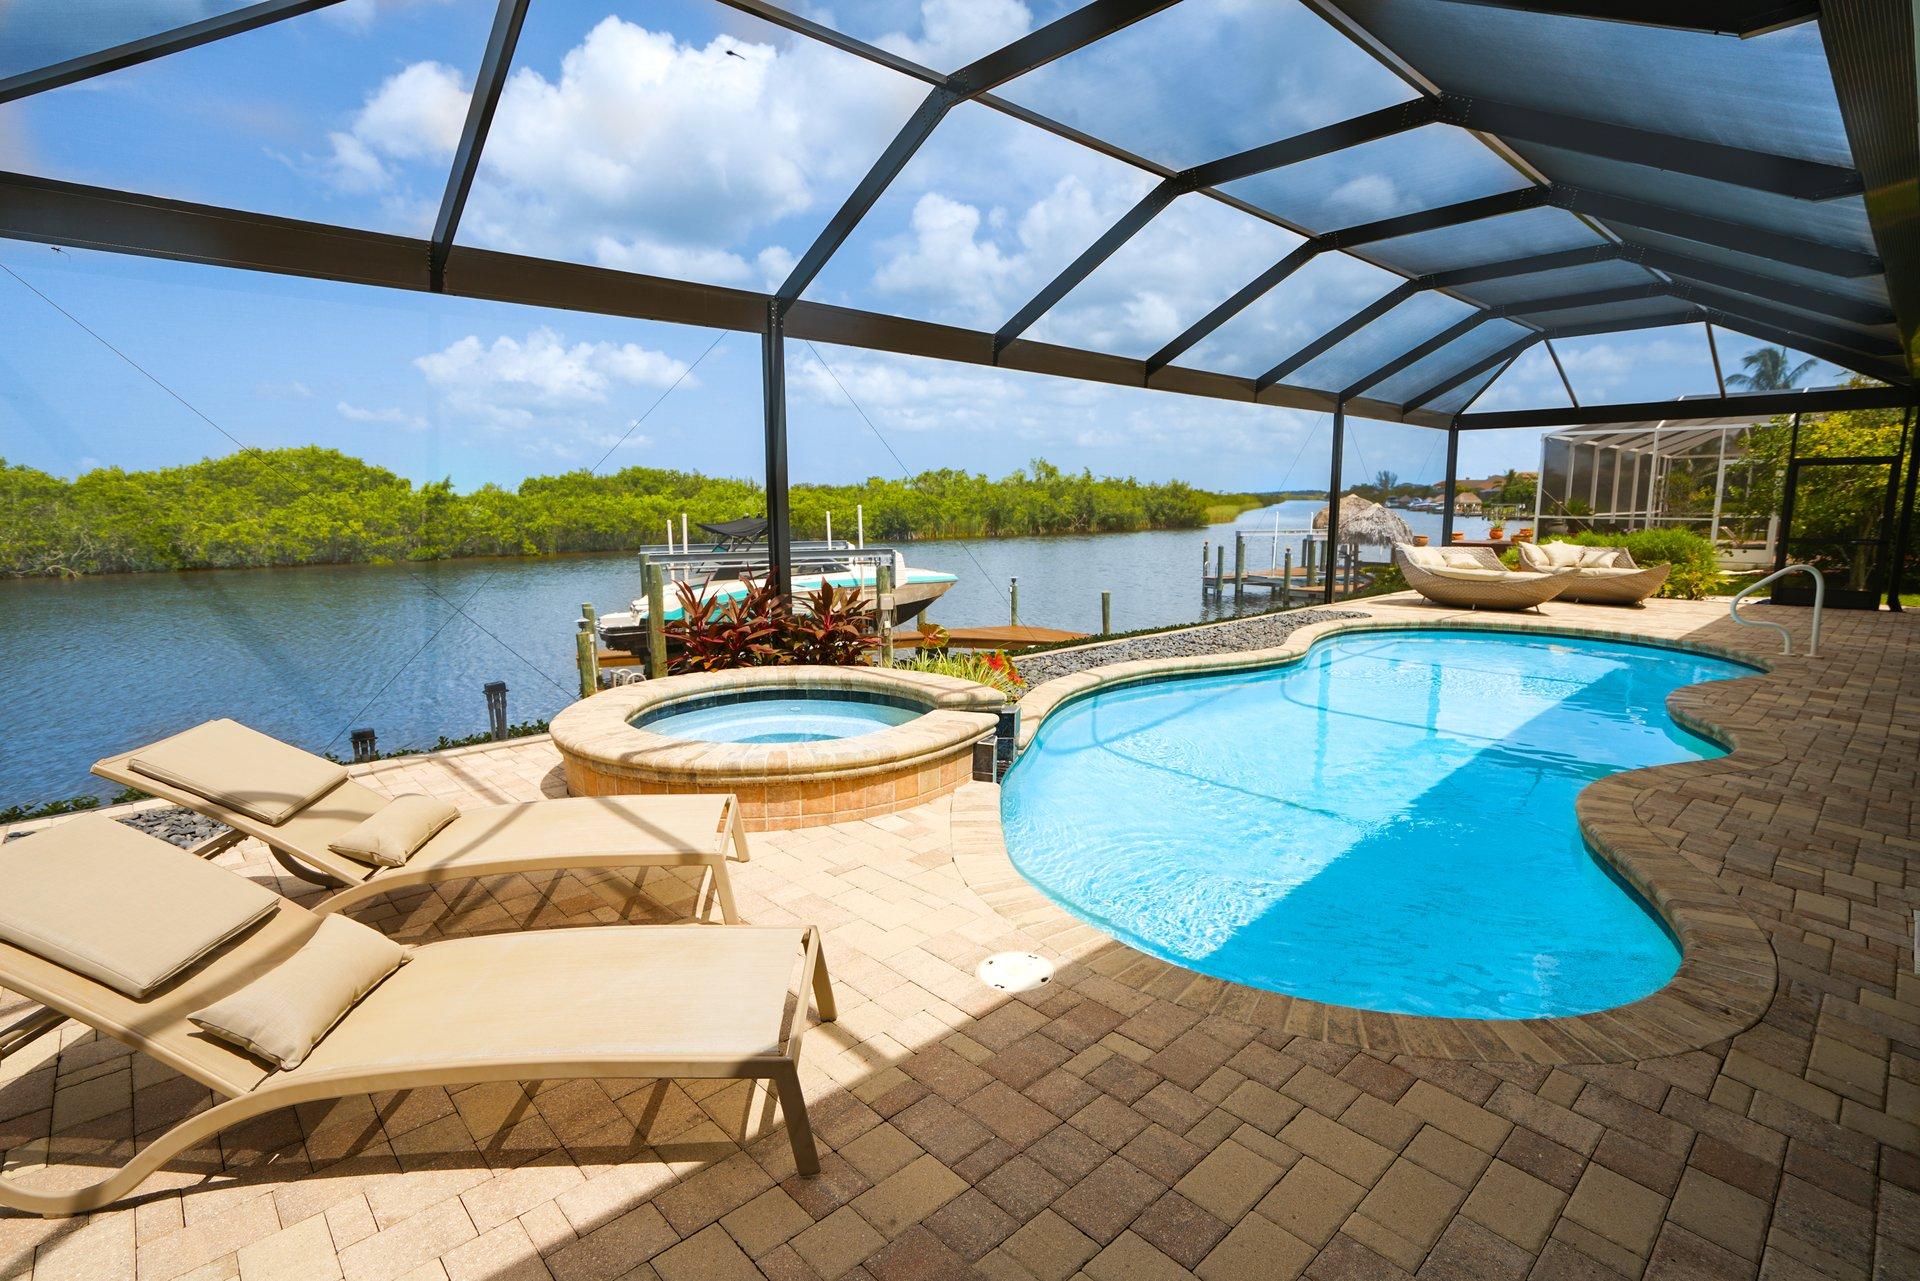 villa surfside new ferienvilla in florida. Black Bedroom Furniture Sets. Home Design Ideas